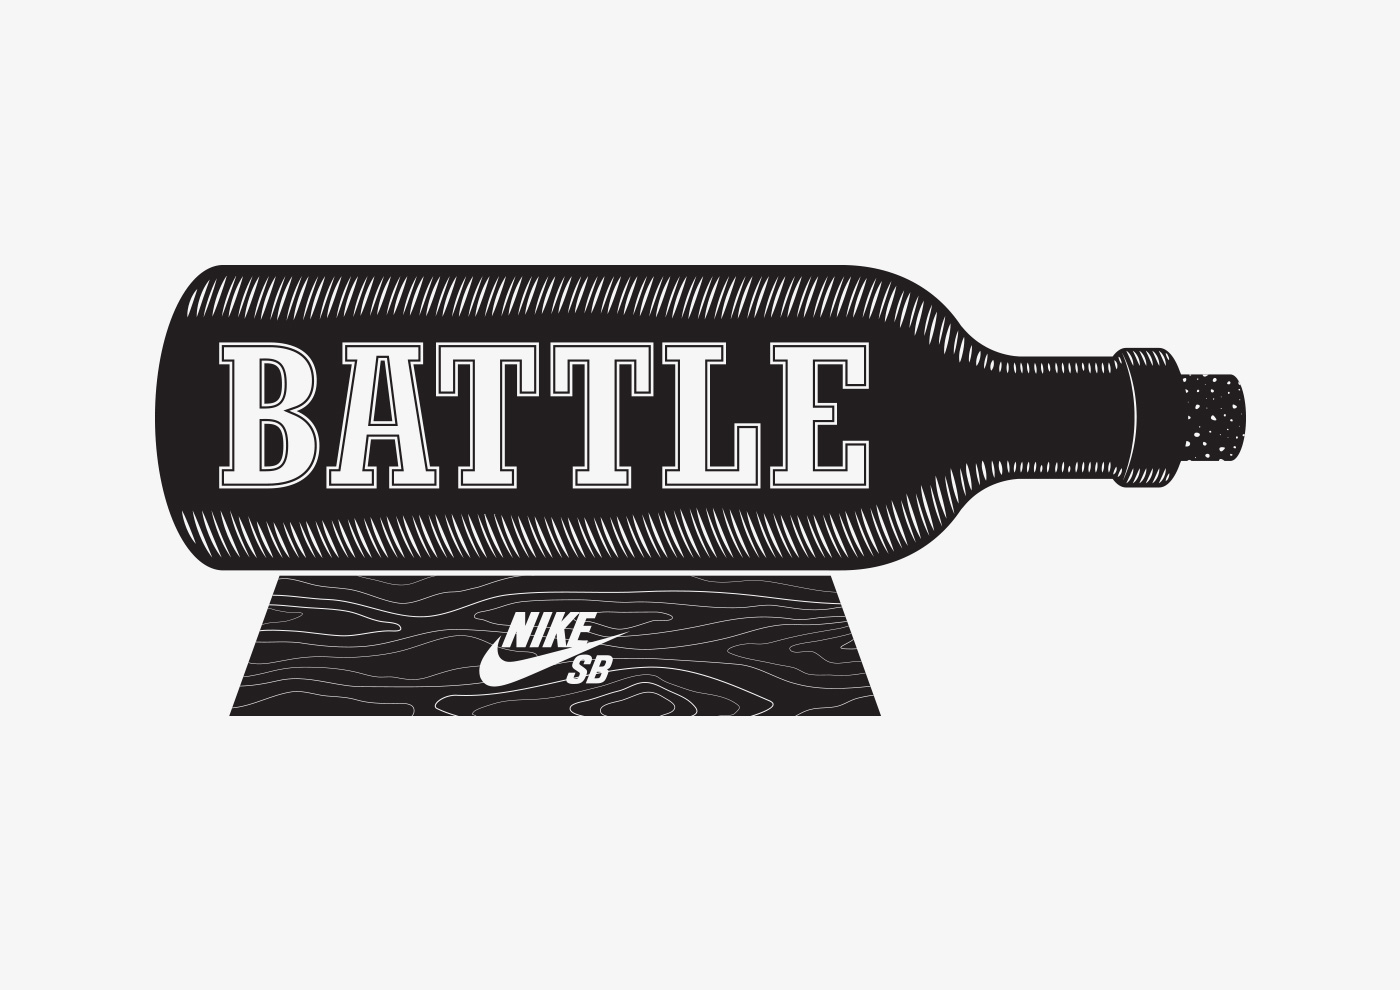 NikeSBbattle_portfolio_1400x790_10.jpg